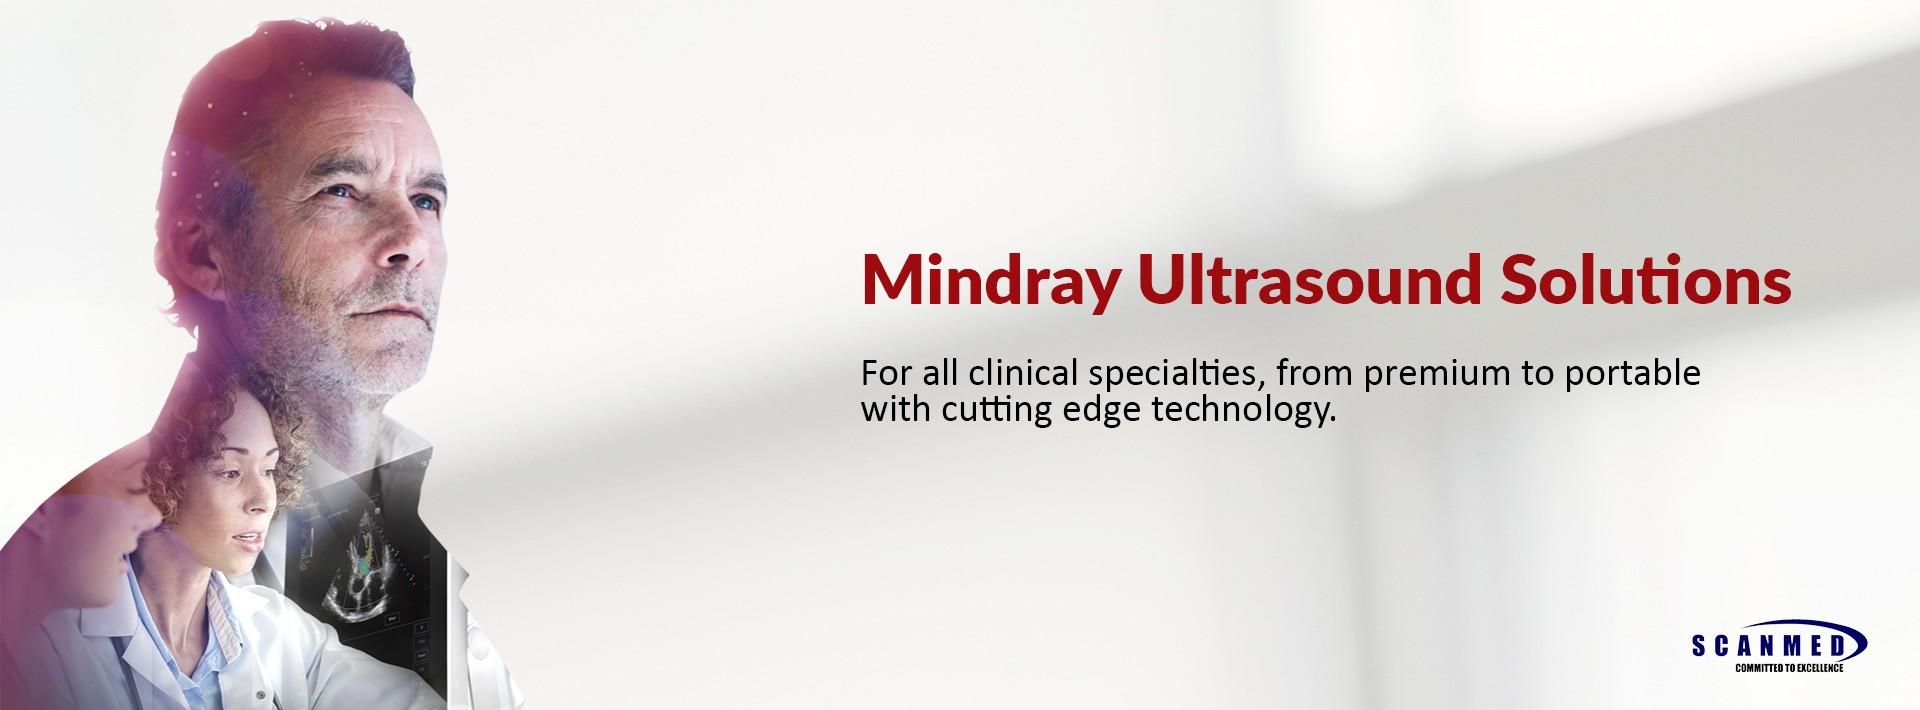 Mindray Ultrasound